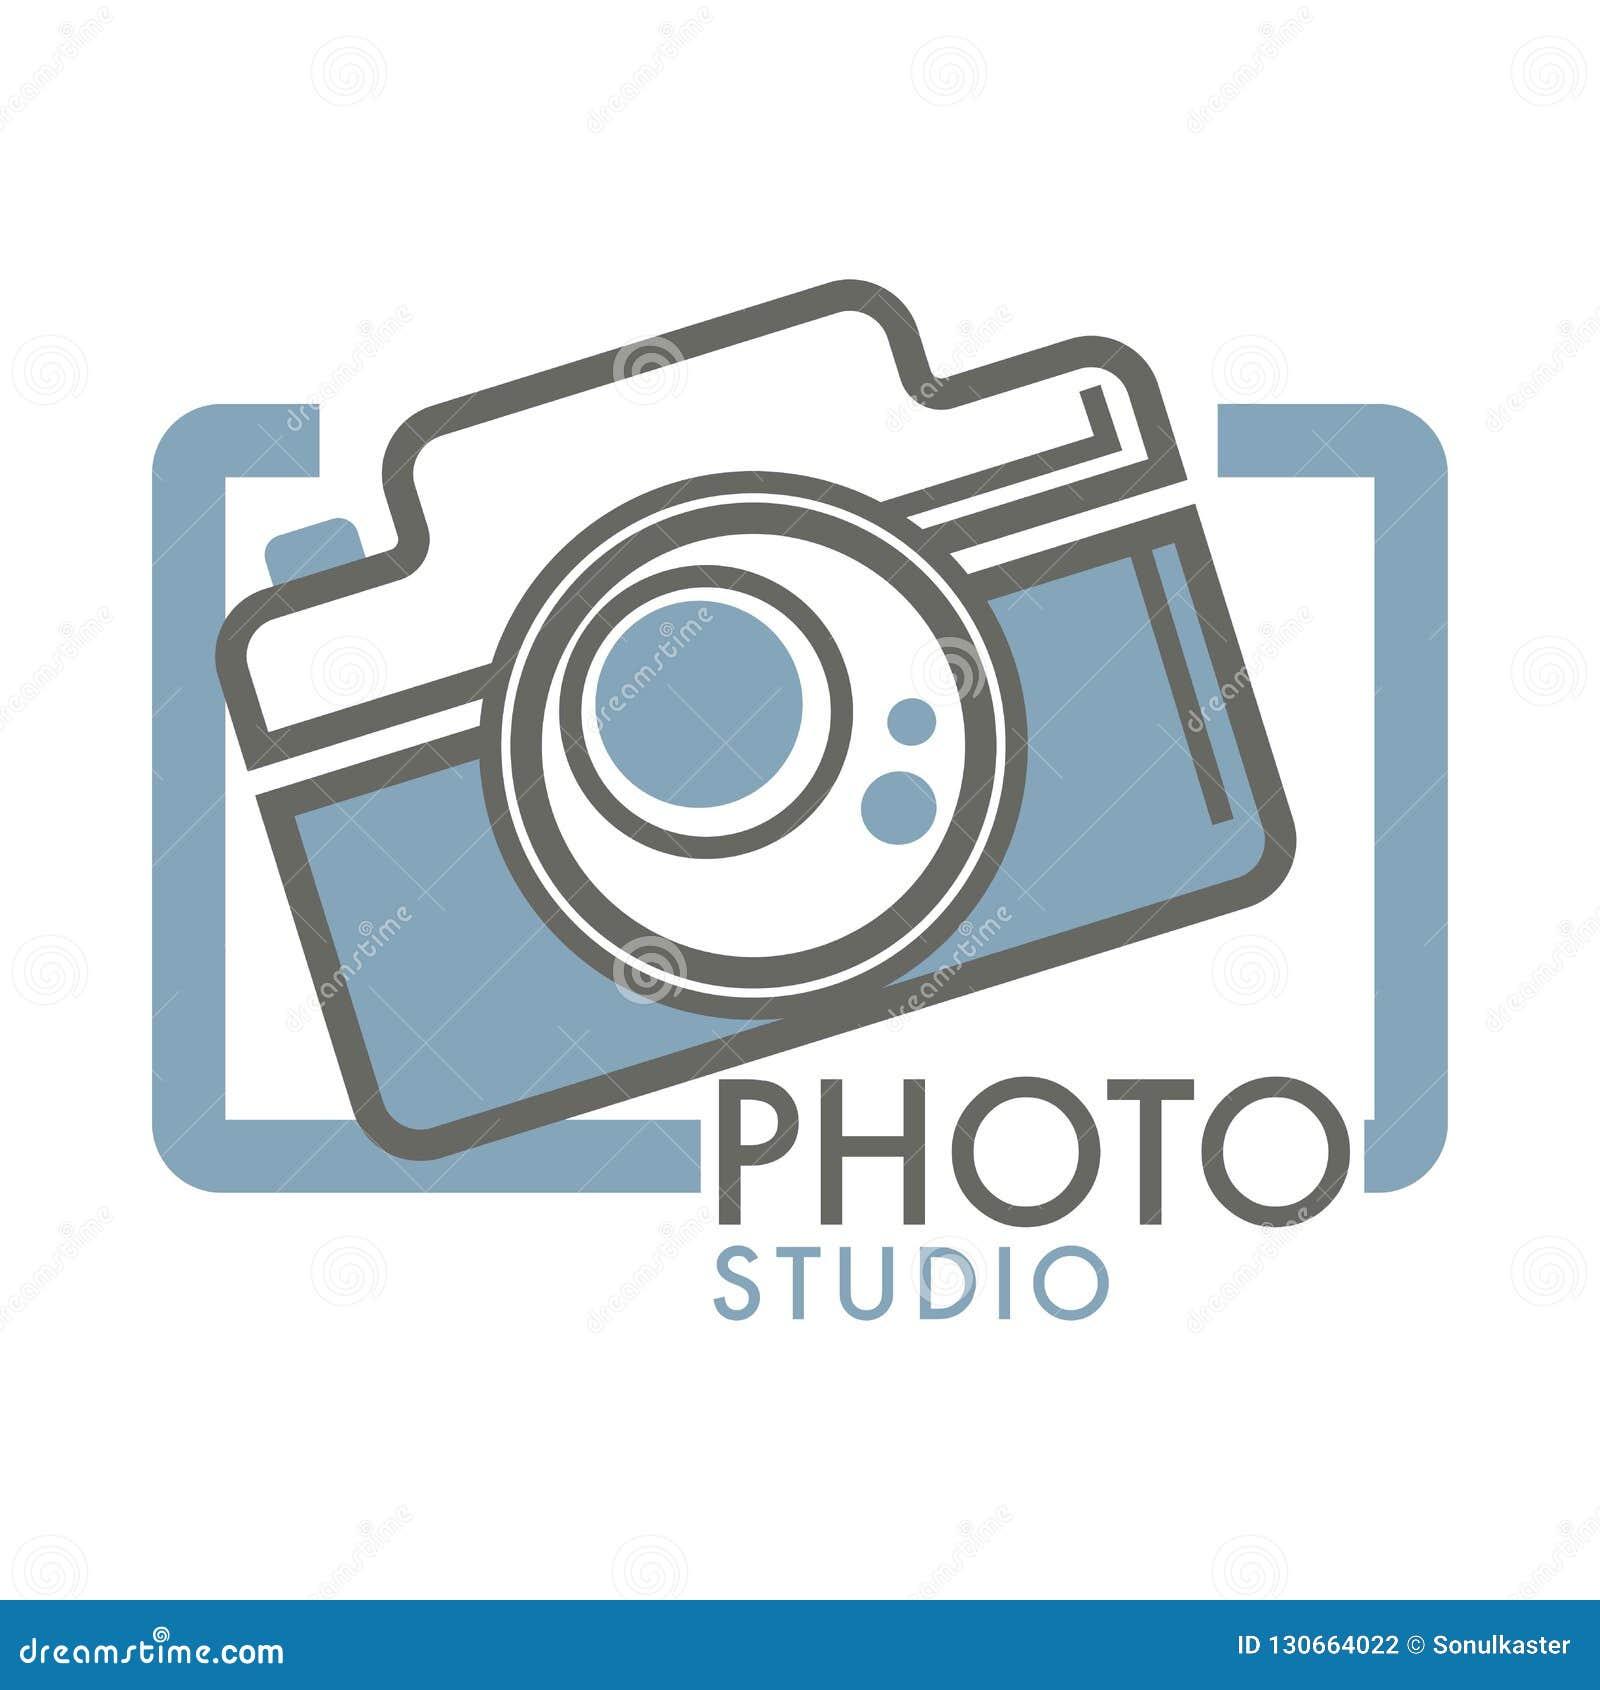 Logo Of Photo Studio, Camera Symbol, Shooting, Photoshoot